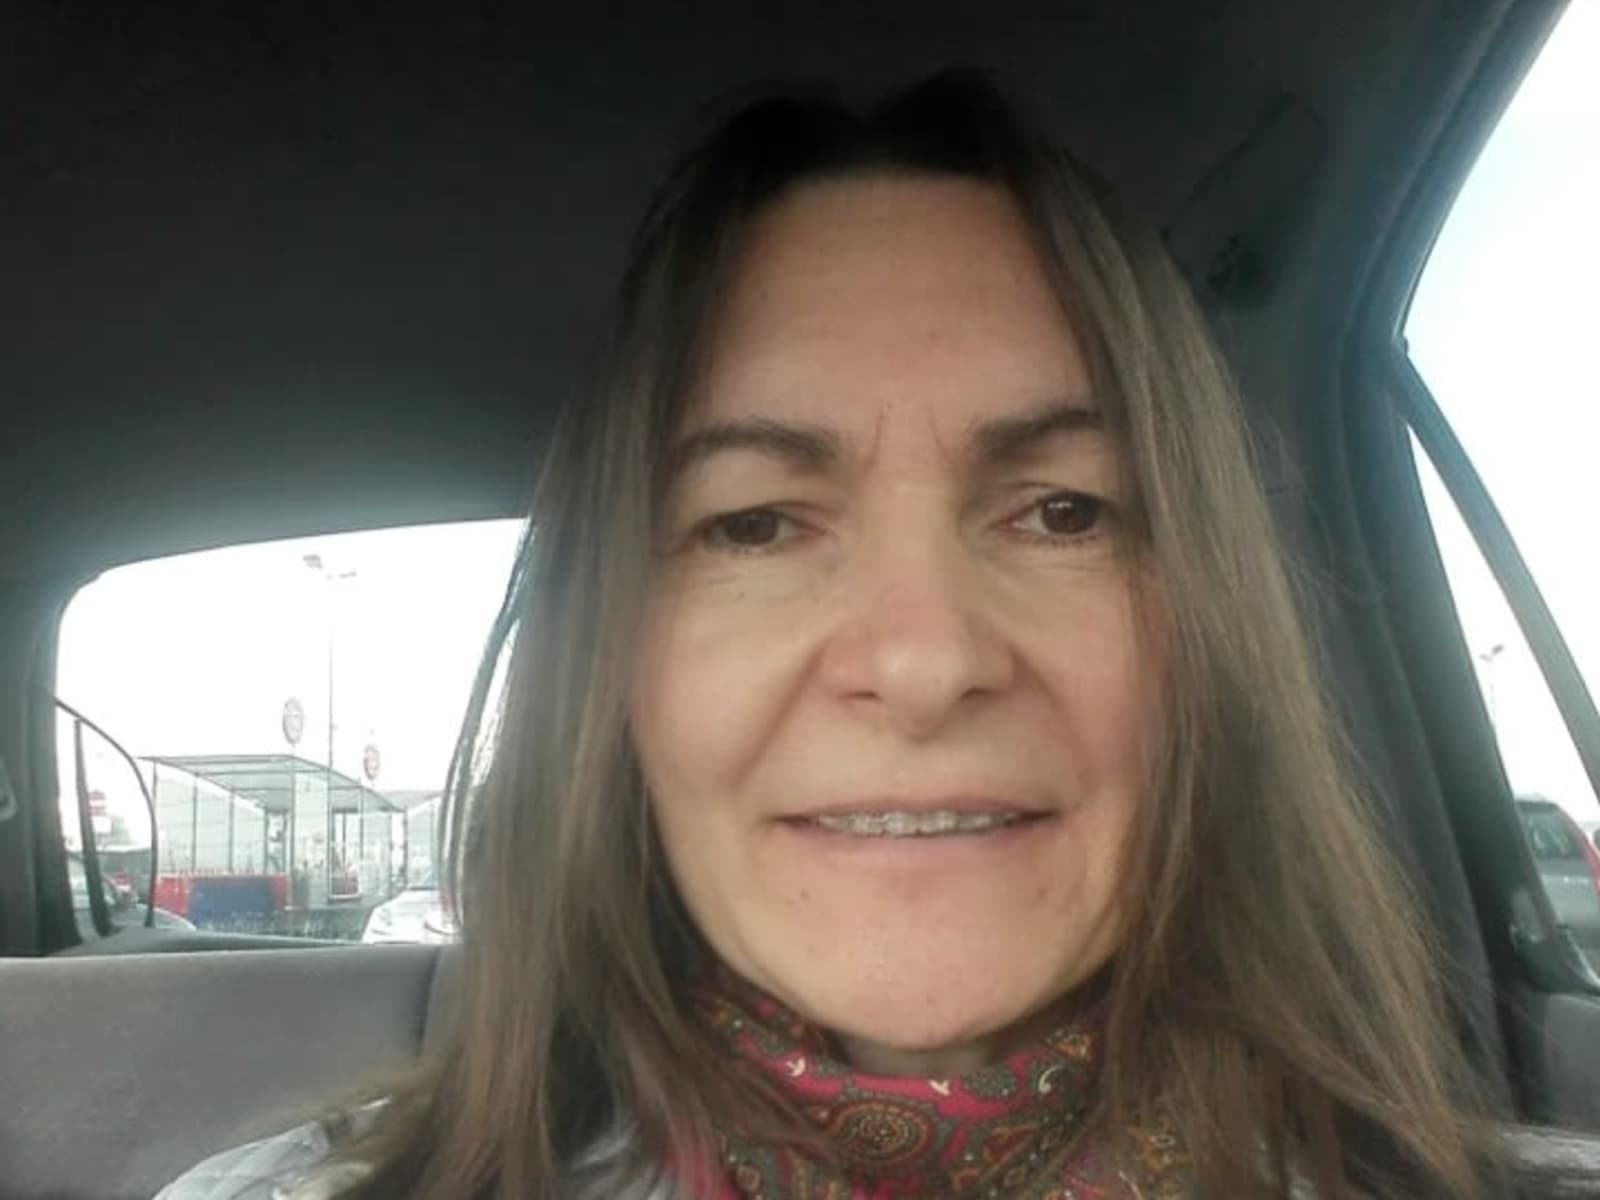 Nicolene from Paris, France